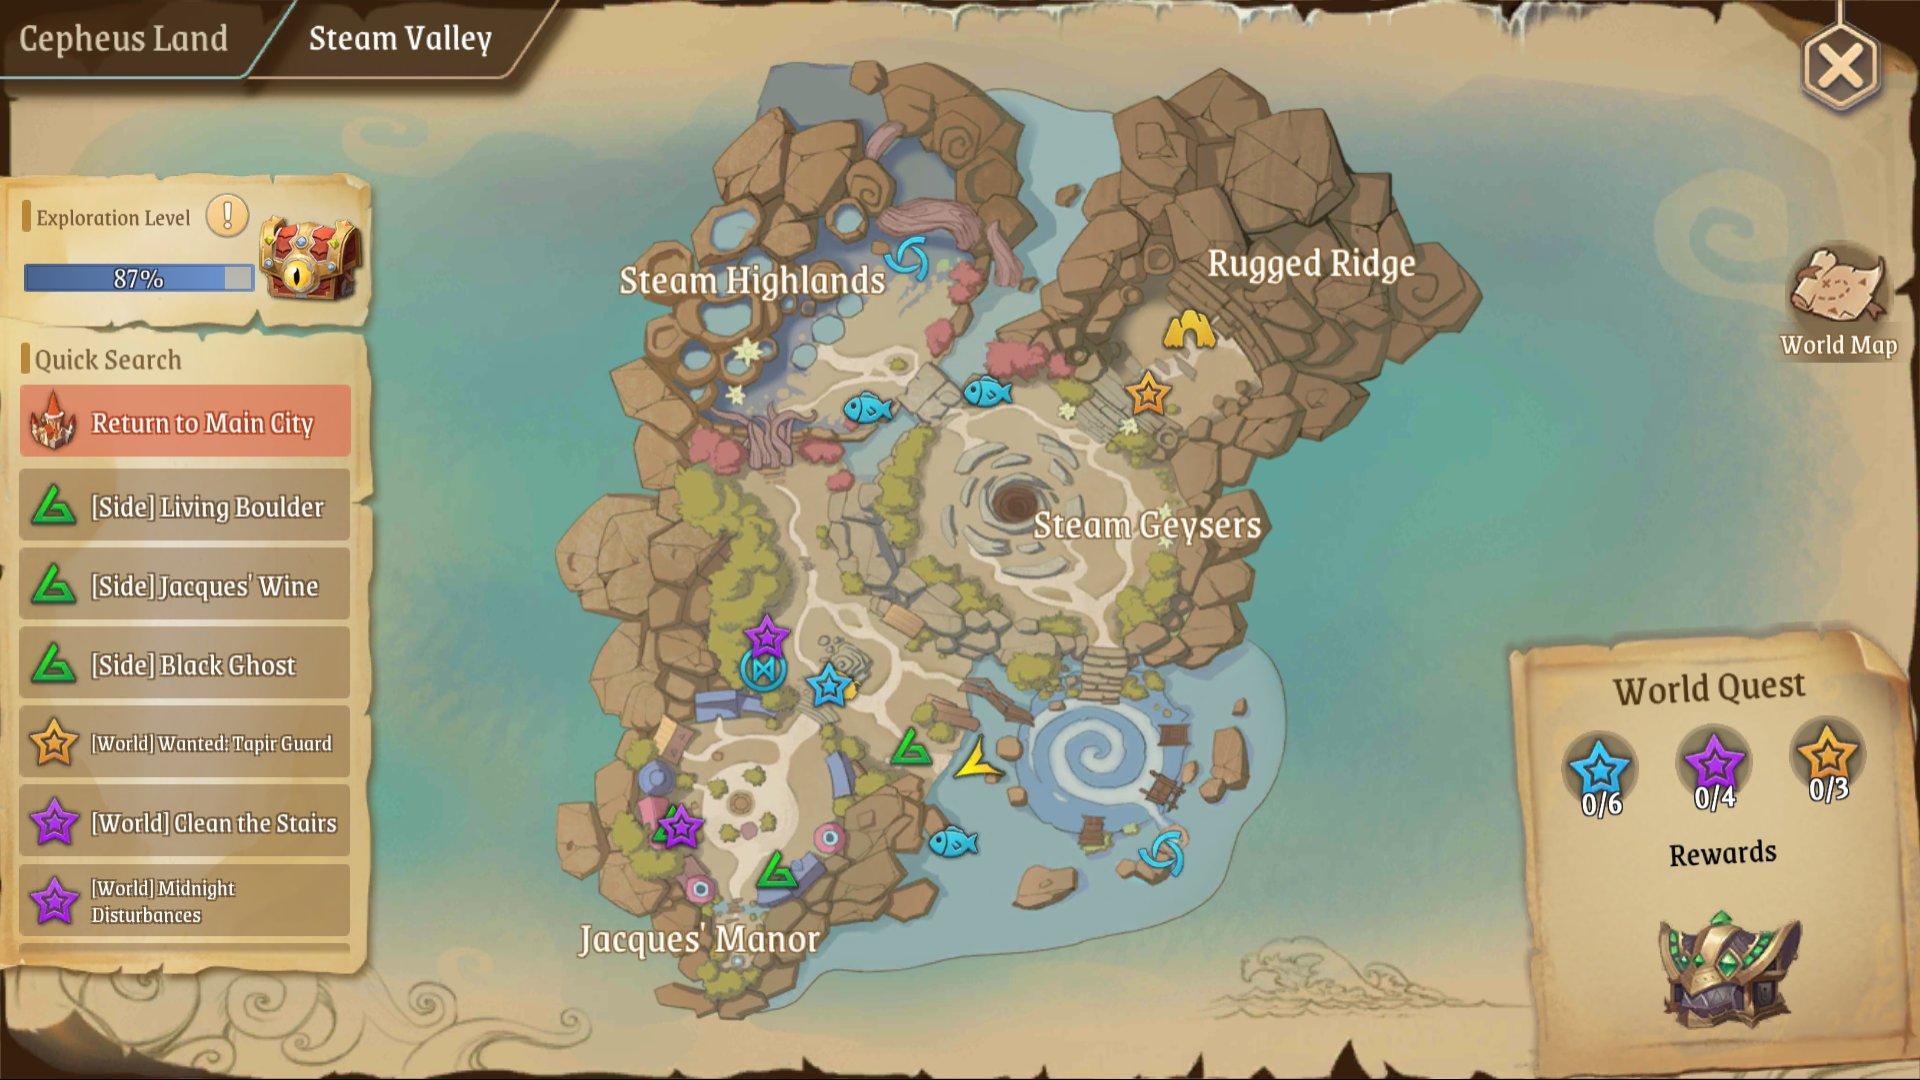 Treasure Map (L) 3: Bottom area near the windmill